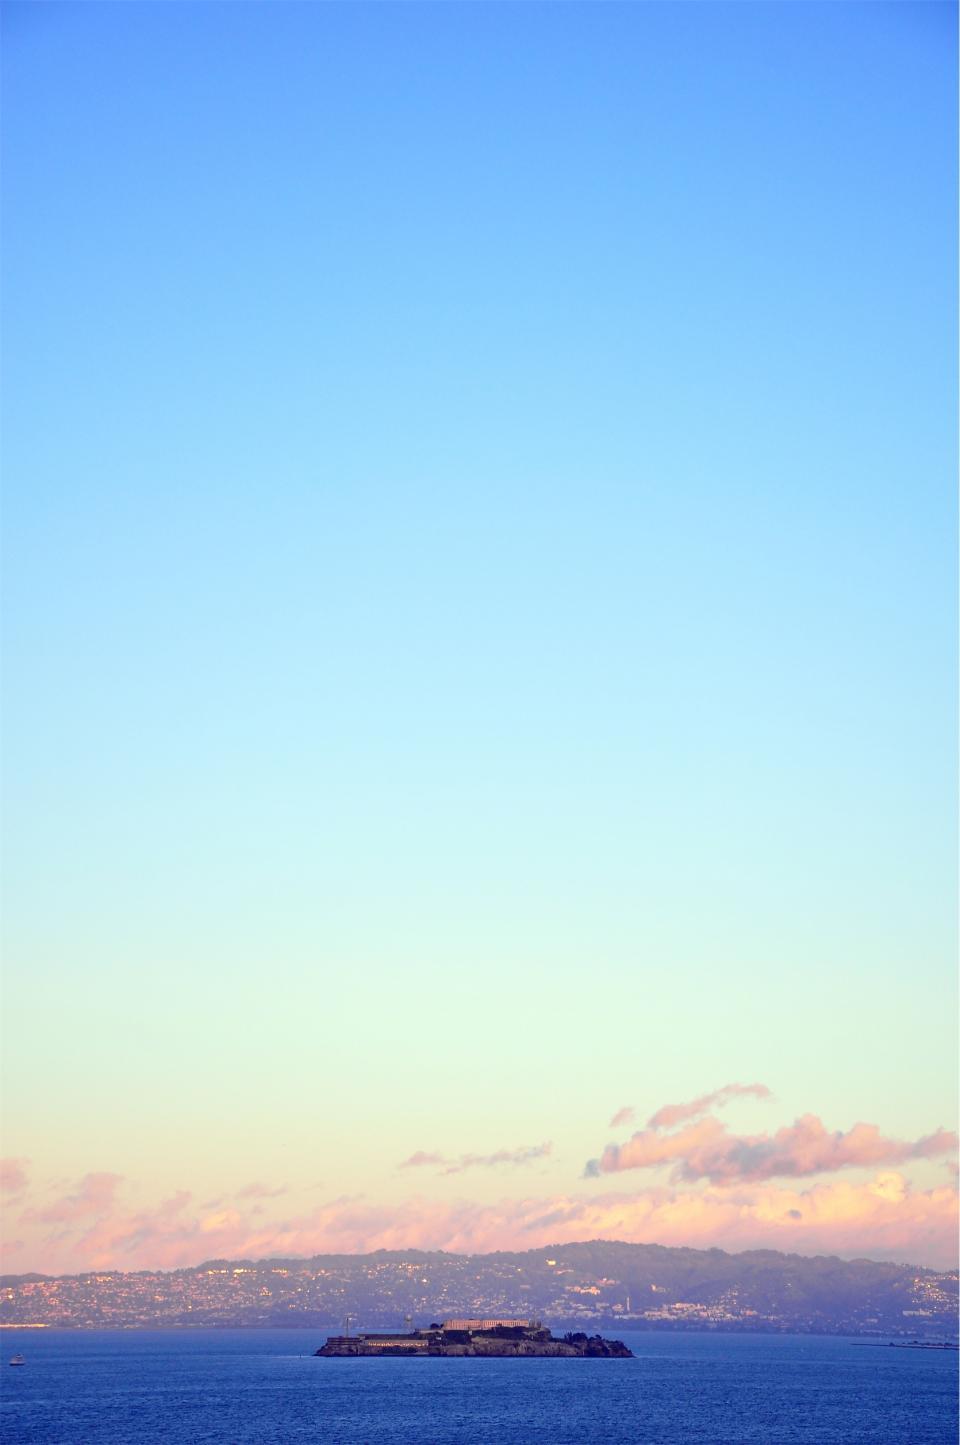 Alcatraz, Island, San Francisco, California, United States, USA, prison, city, mountains, hills, sky, clouds, water